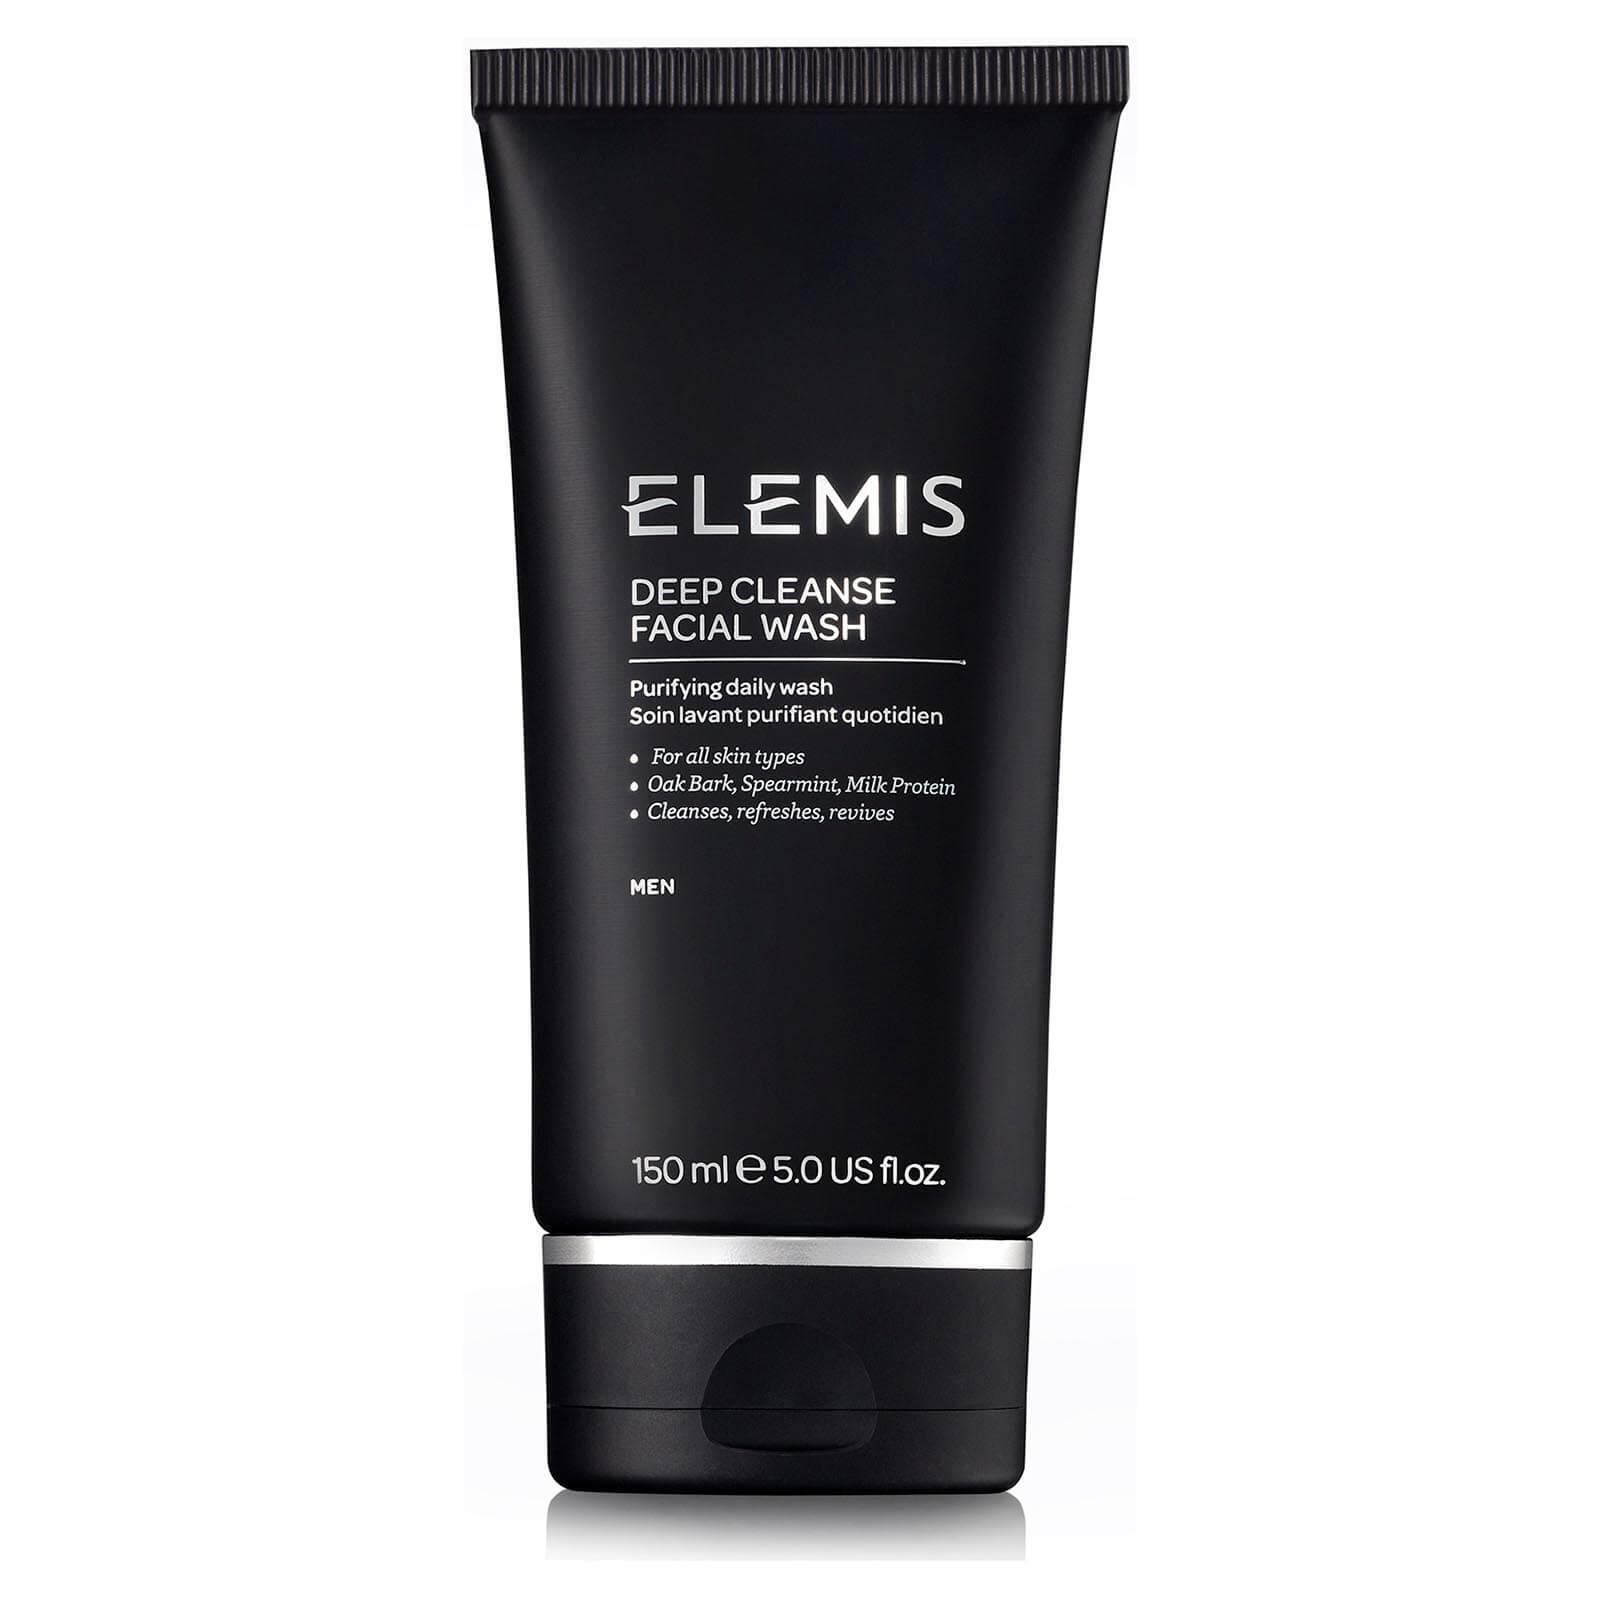 Elemis+Deep+Cleanse+Facial